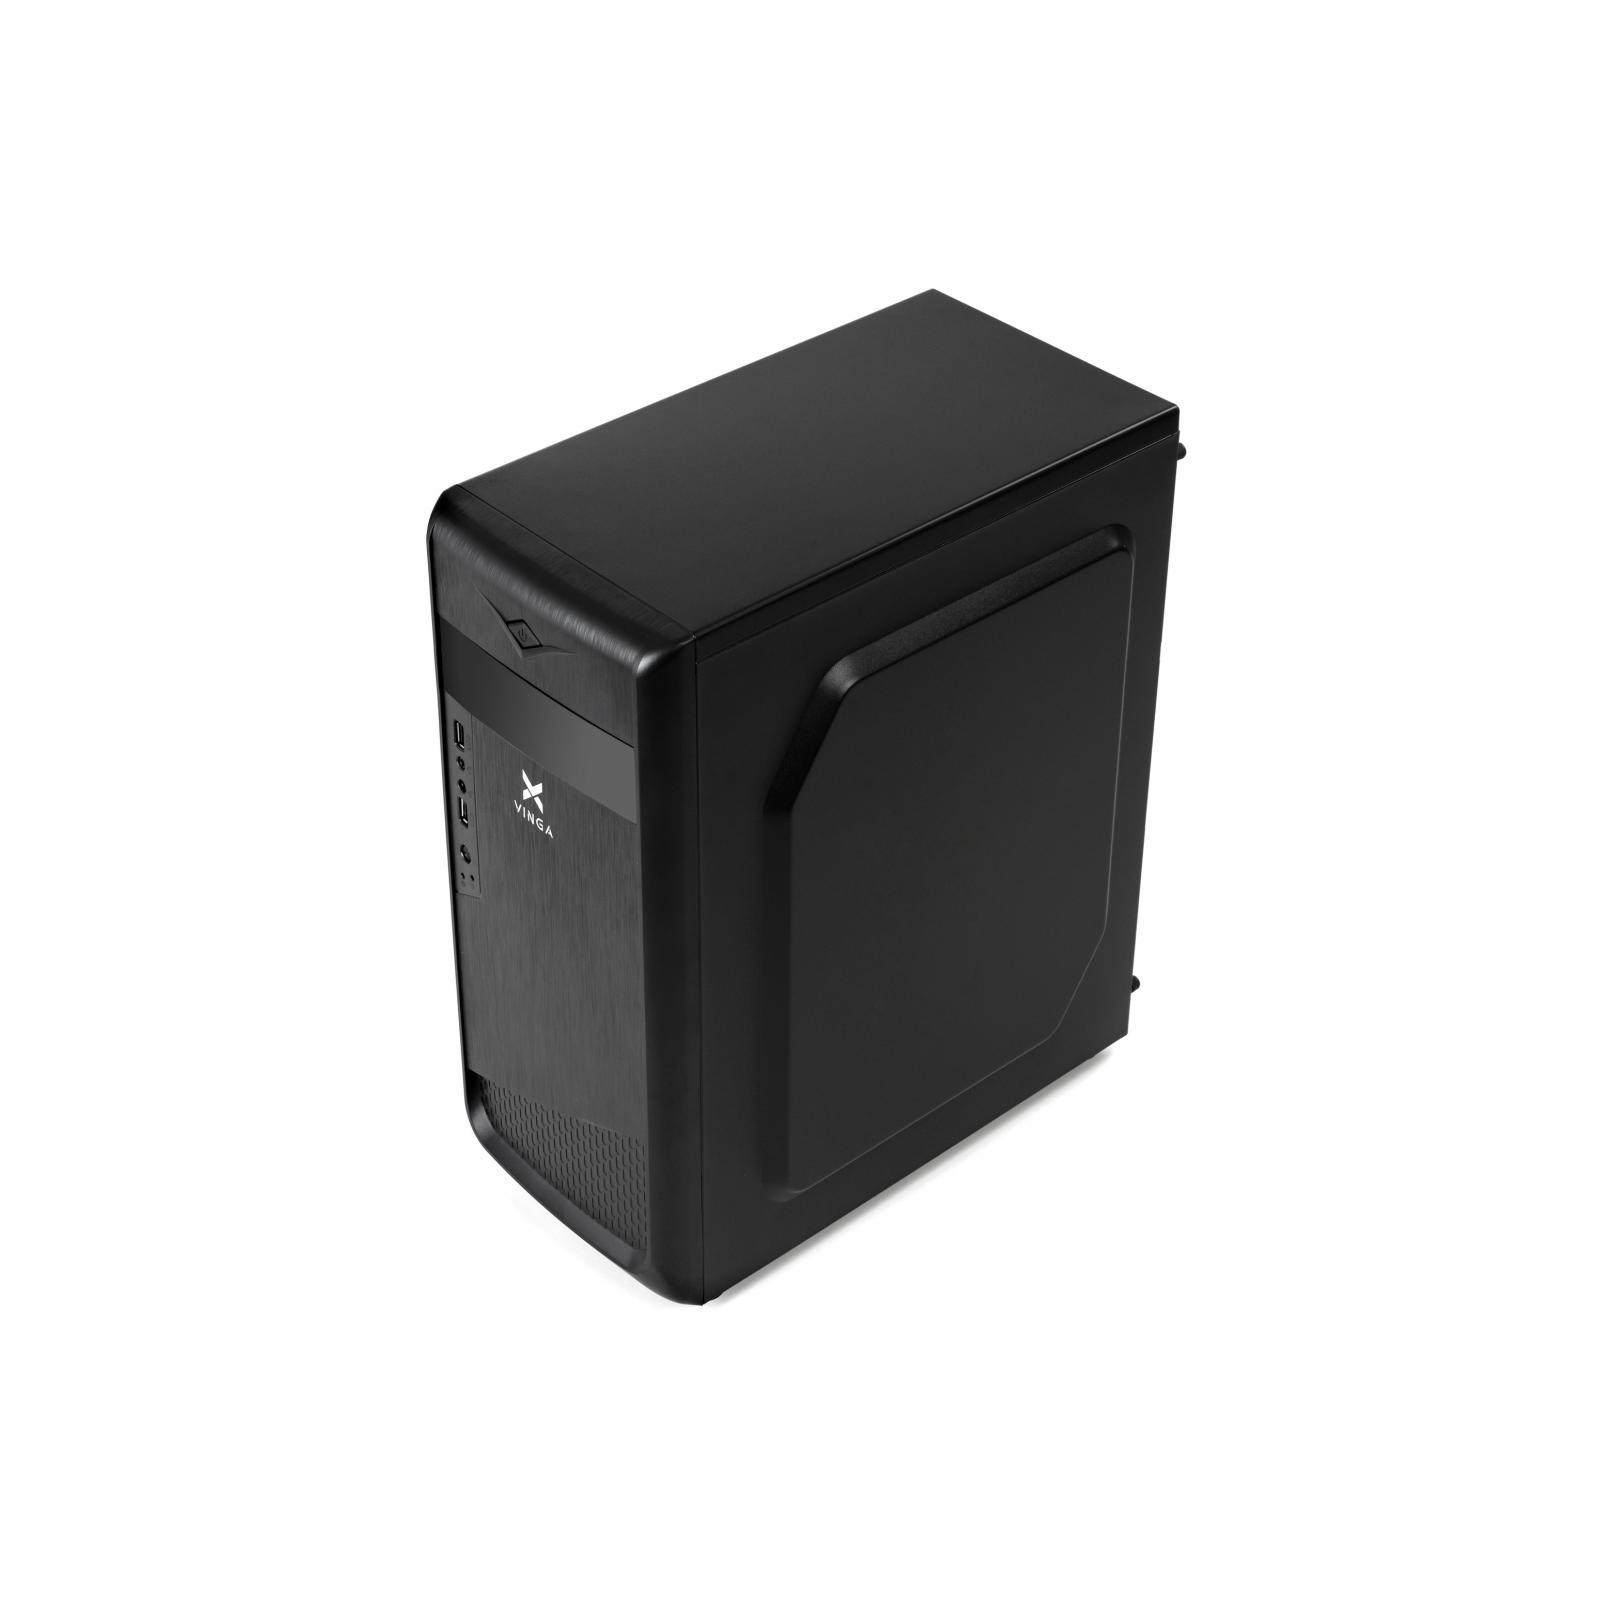 Компьютер Vinga Basic A0171 (E1M4INTW.A0171) изображение 5